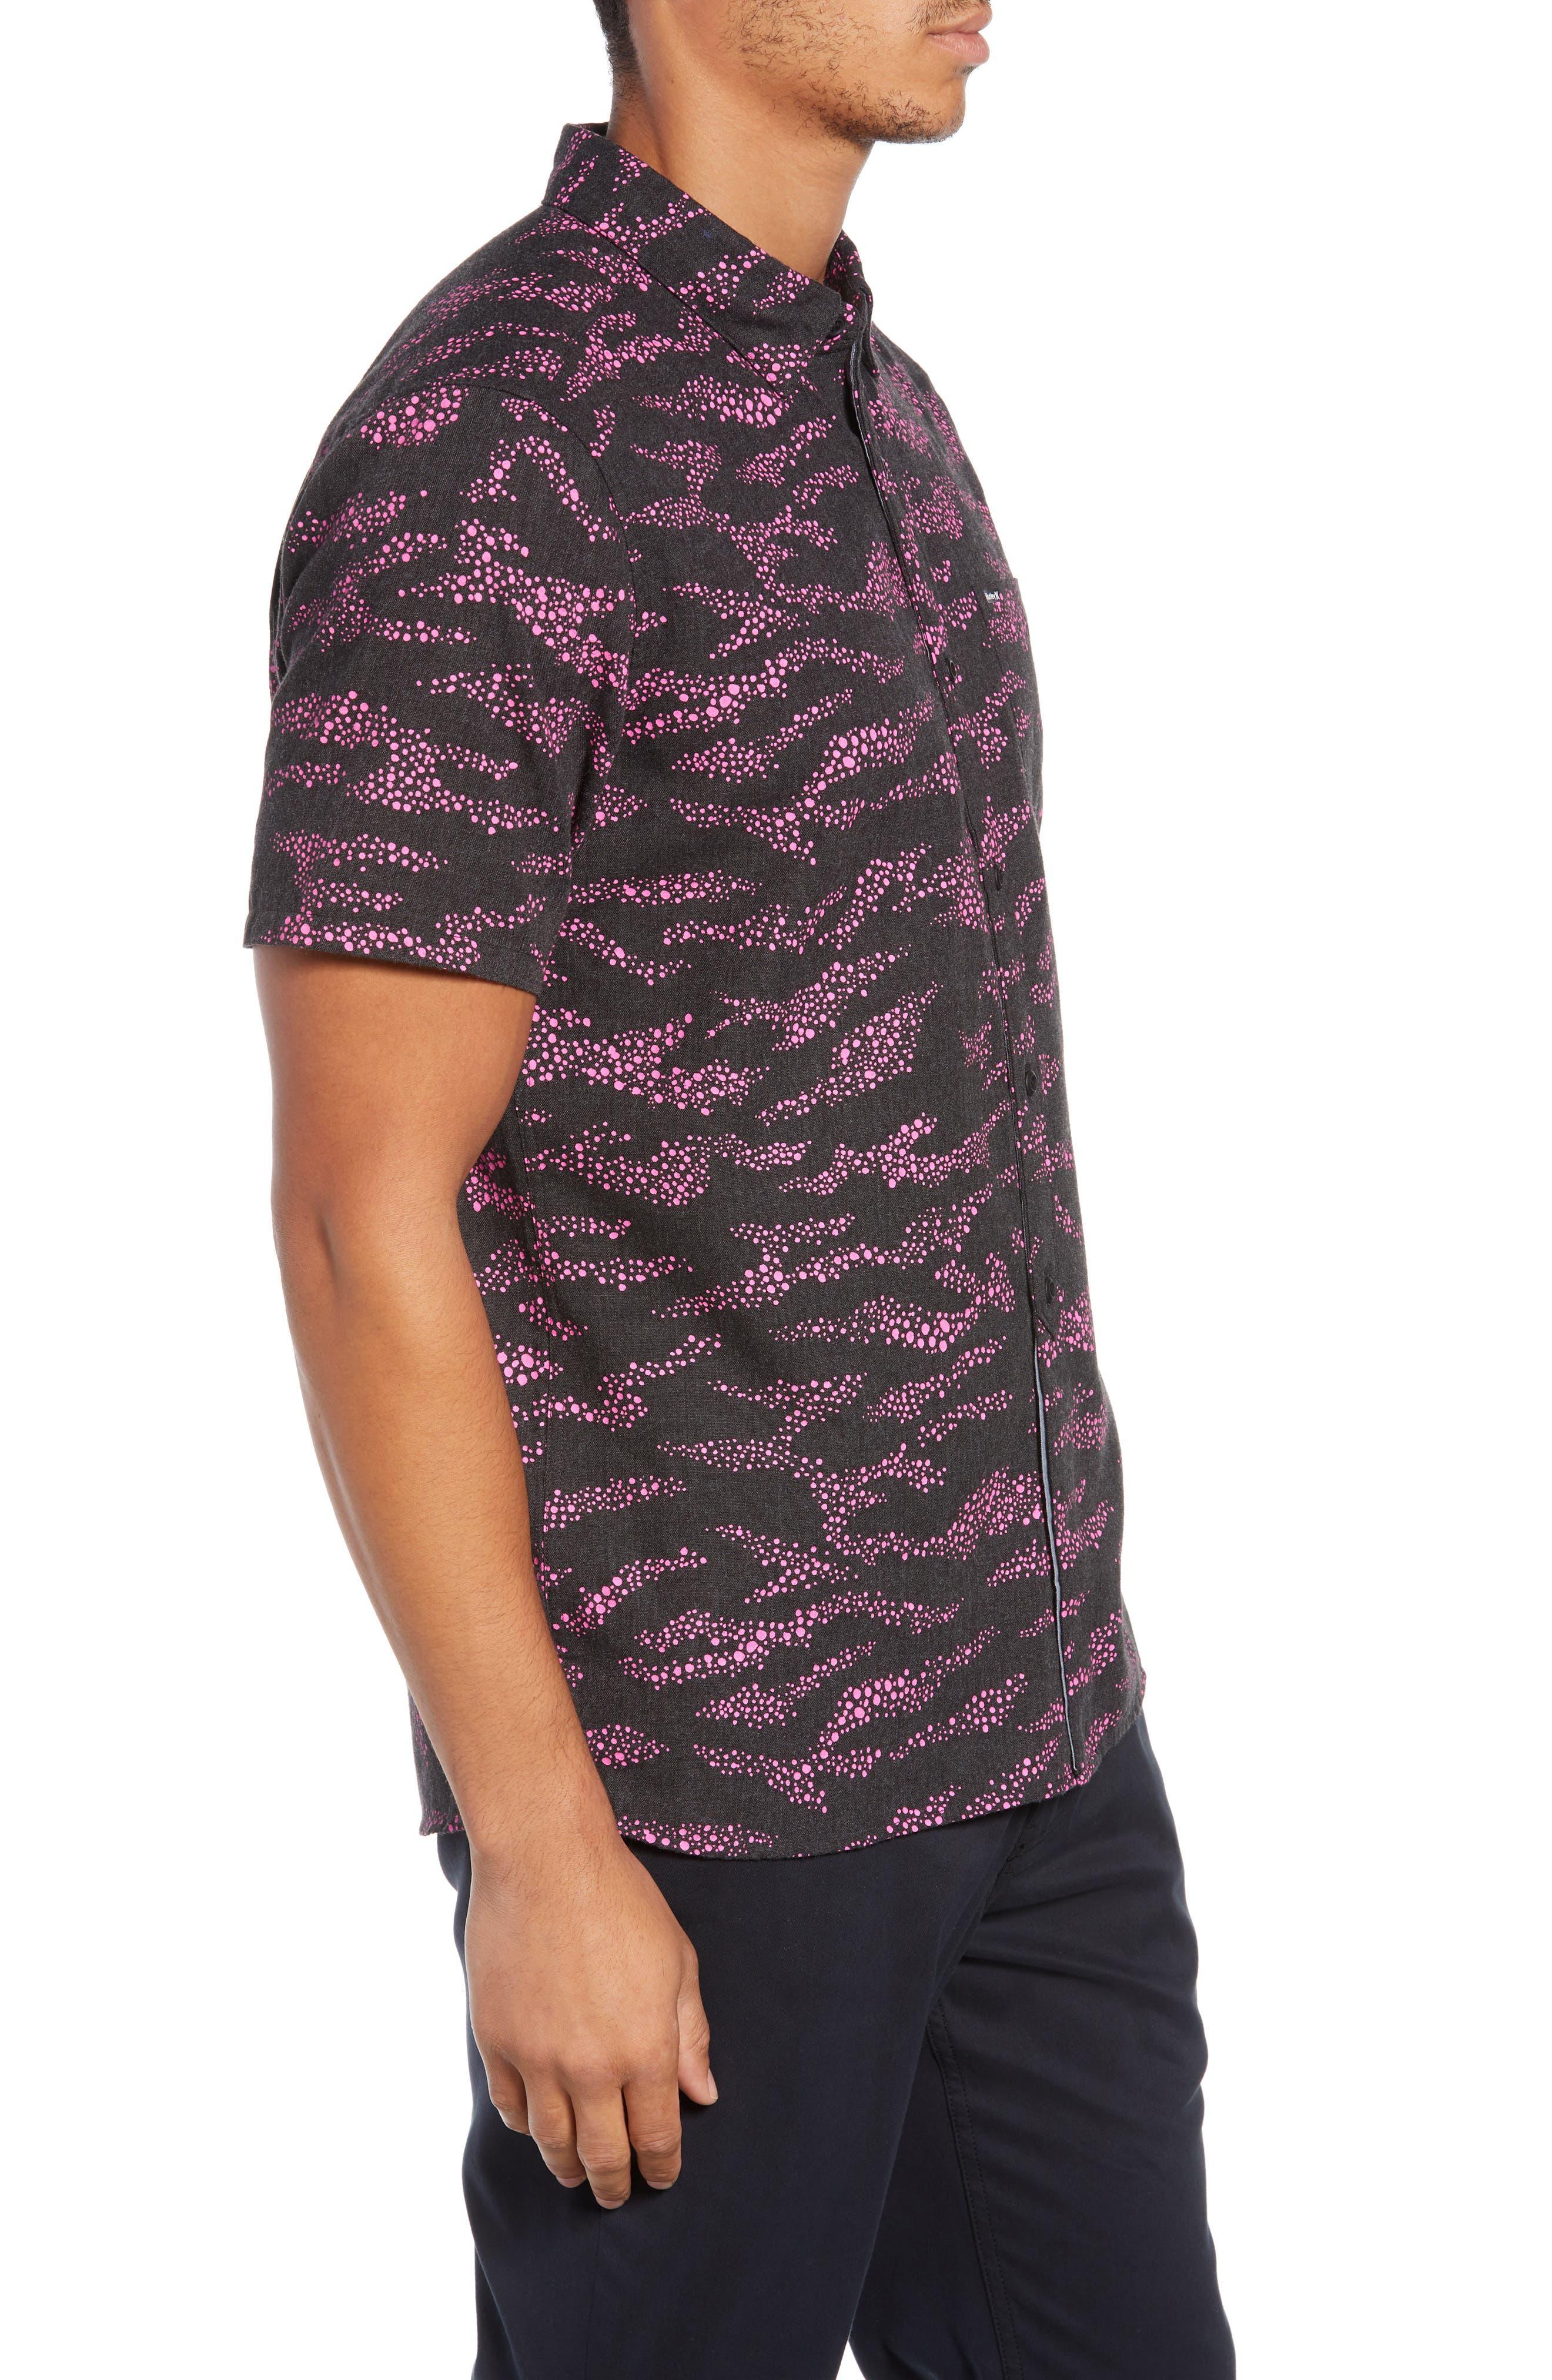 Outcast Woven Shirt,                             Alternate thumbnail 4, color,                             BLACK HEATHER